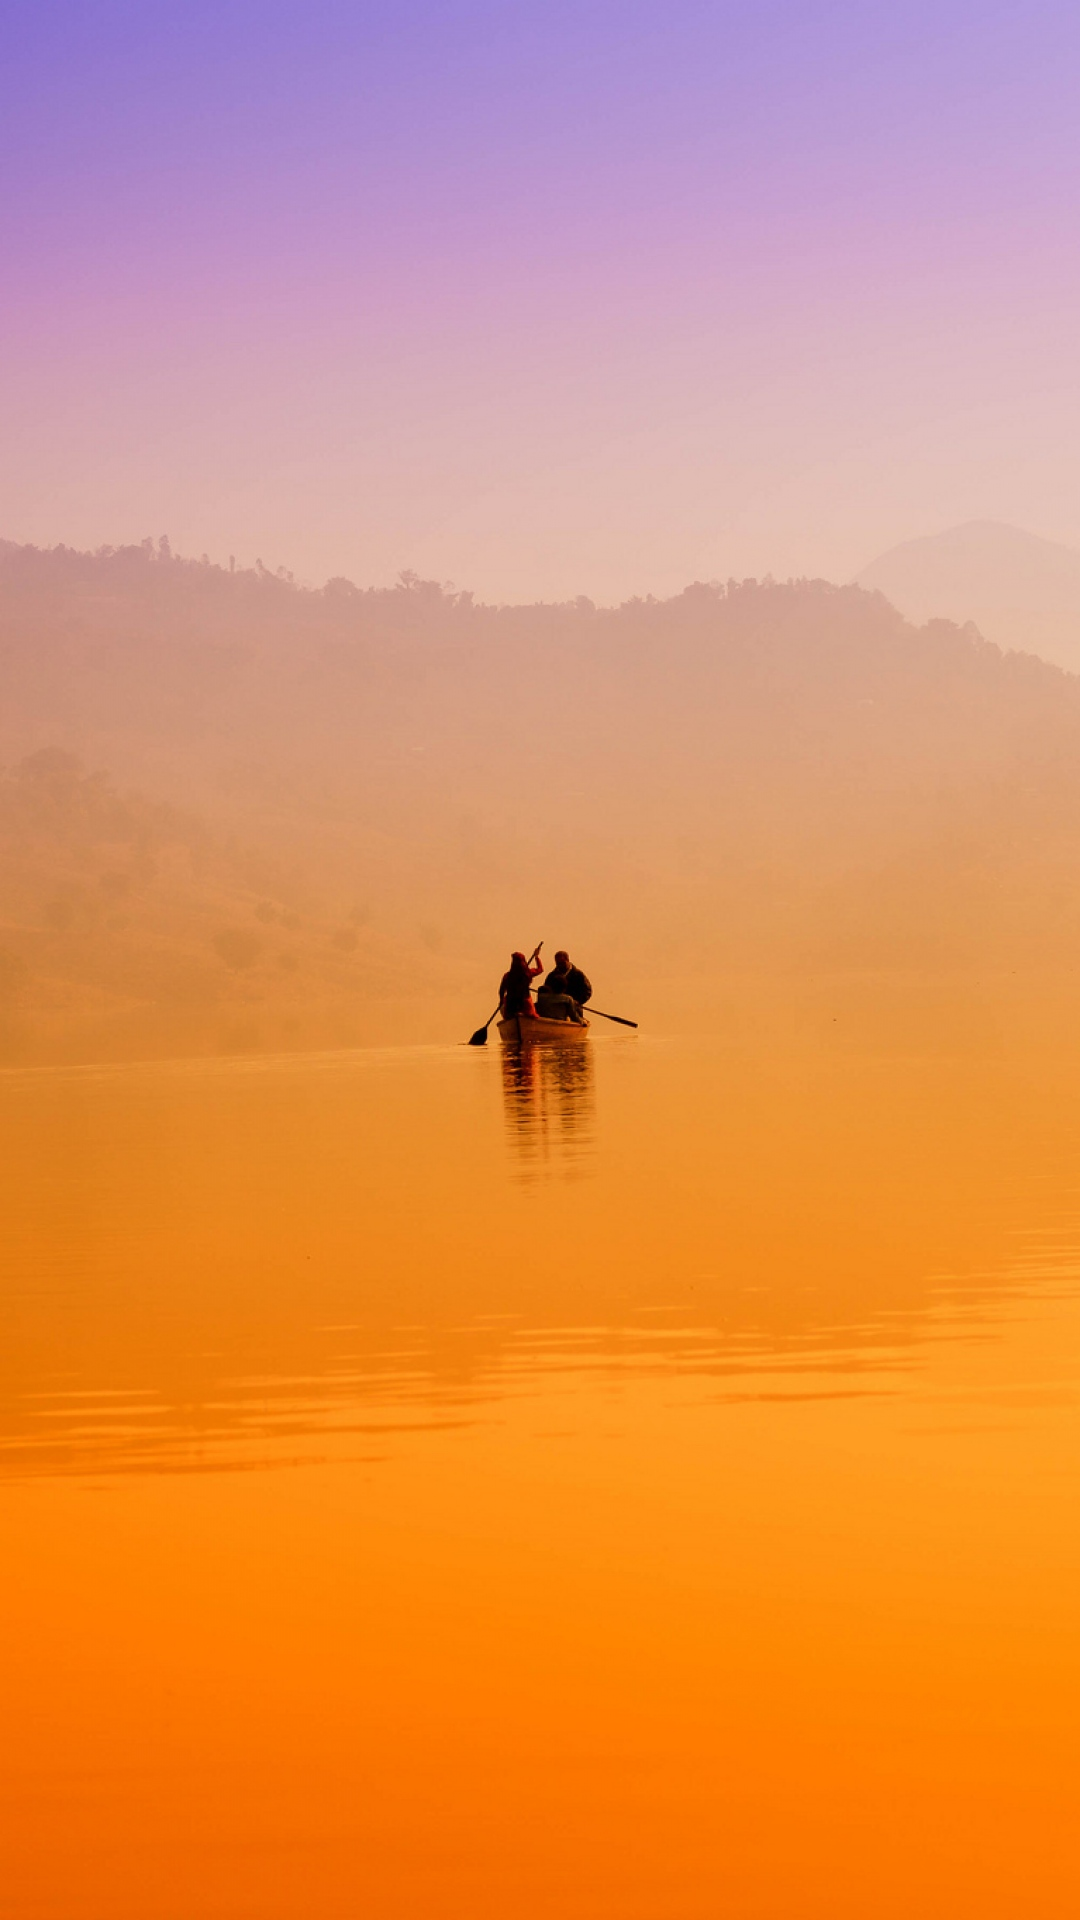 boat lake mist hills 100244 1080x1920 Boat